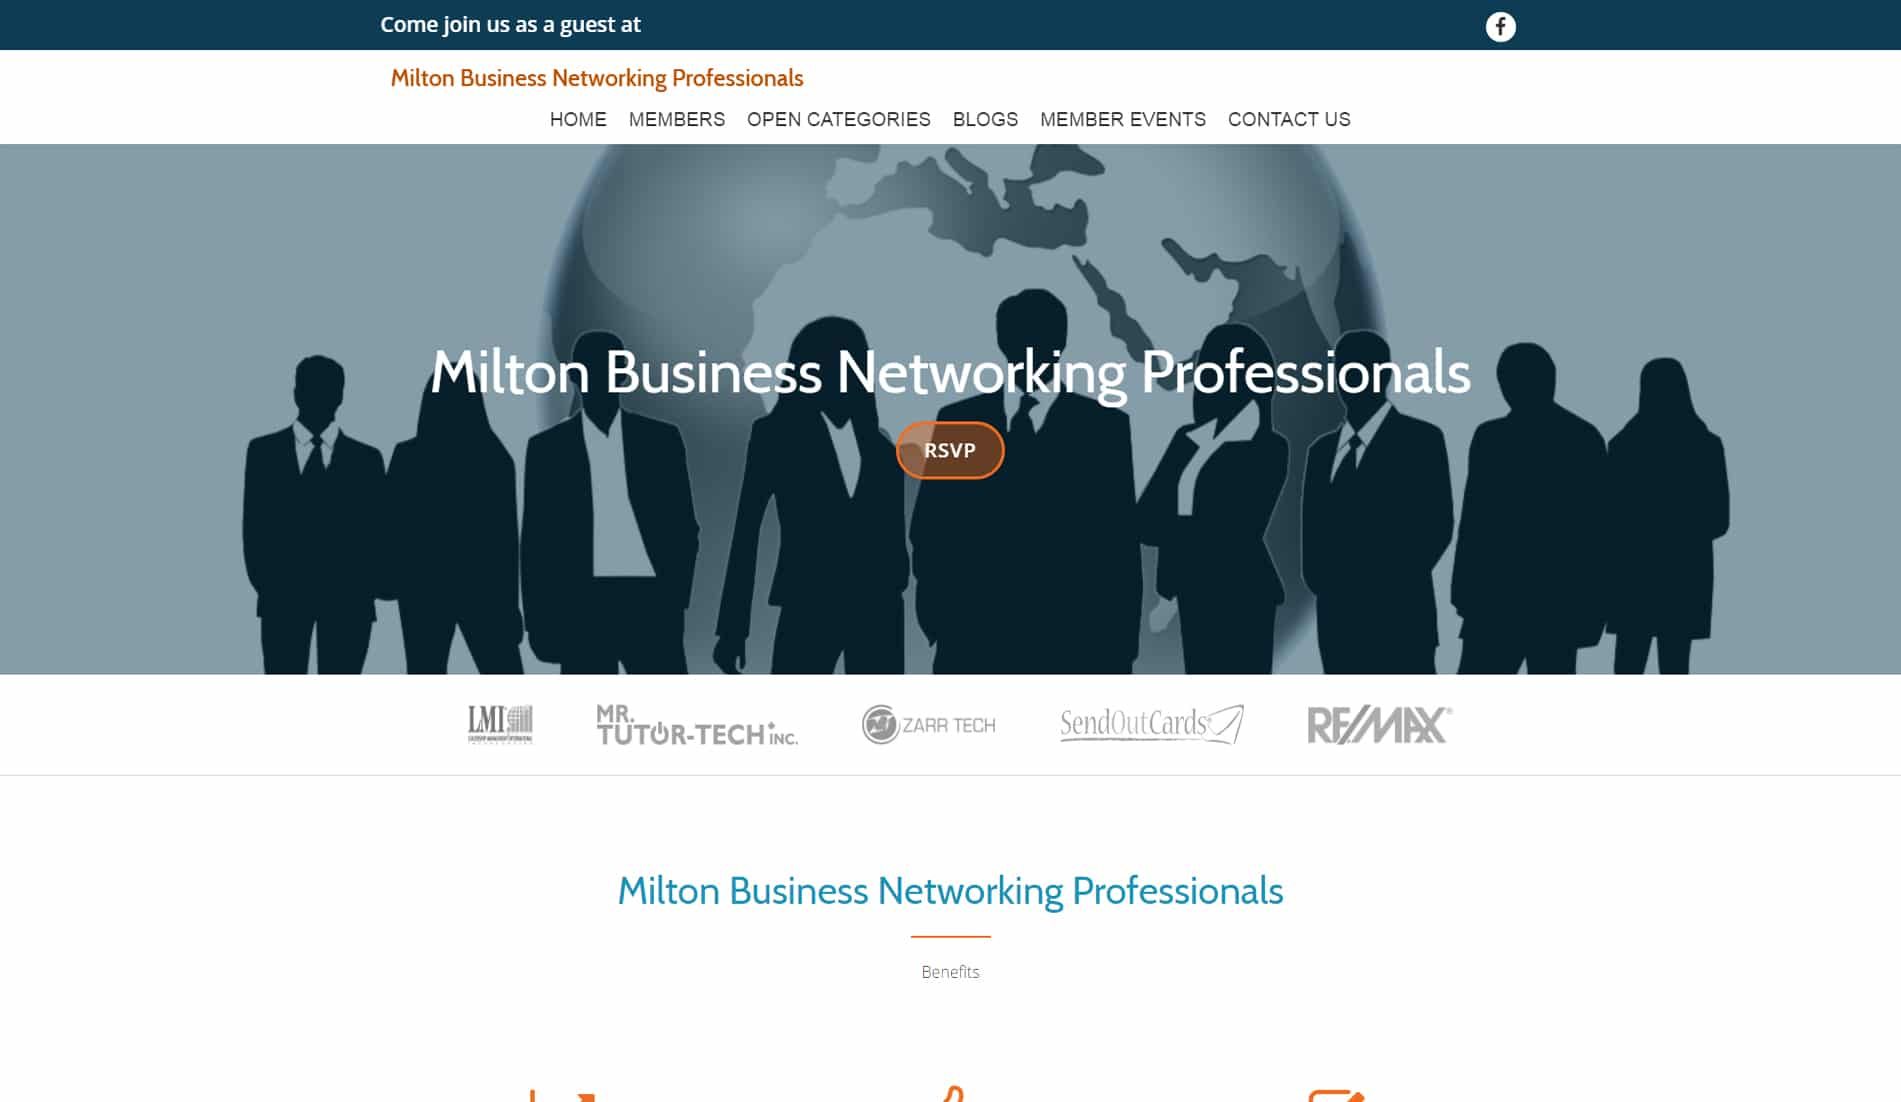 Mr.Tutor-Tech Website Design Milton Mbnp Website Design Slide 1